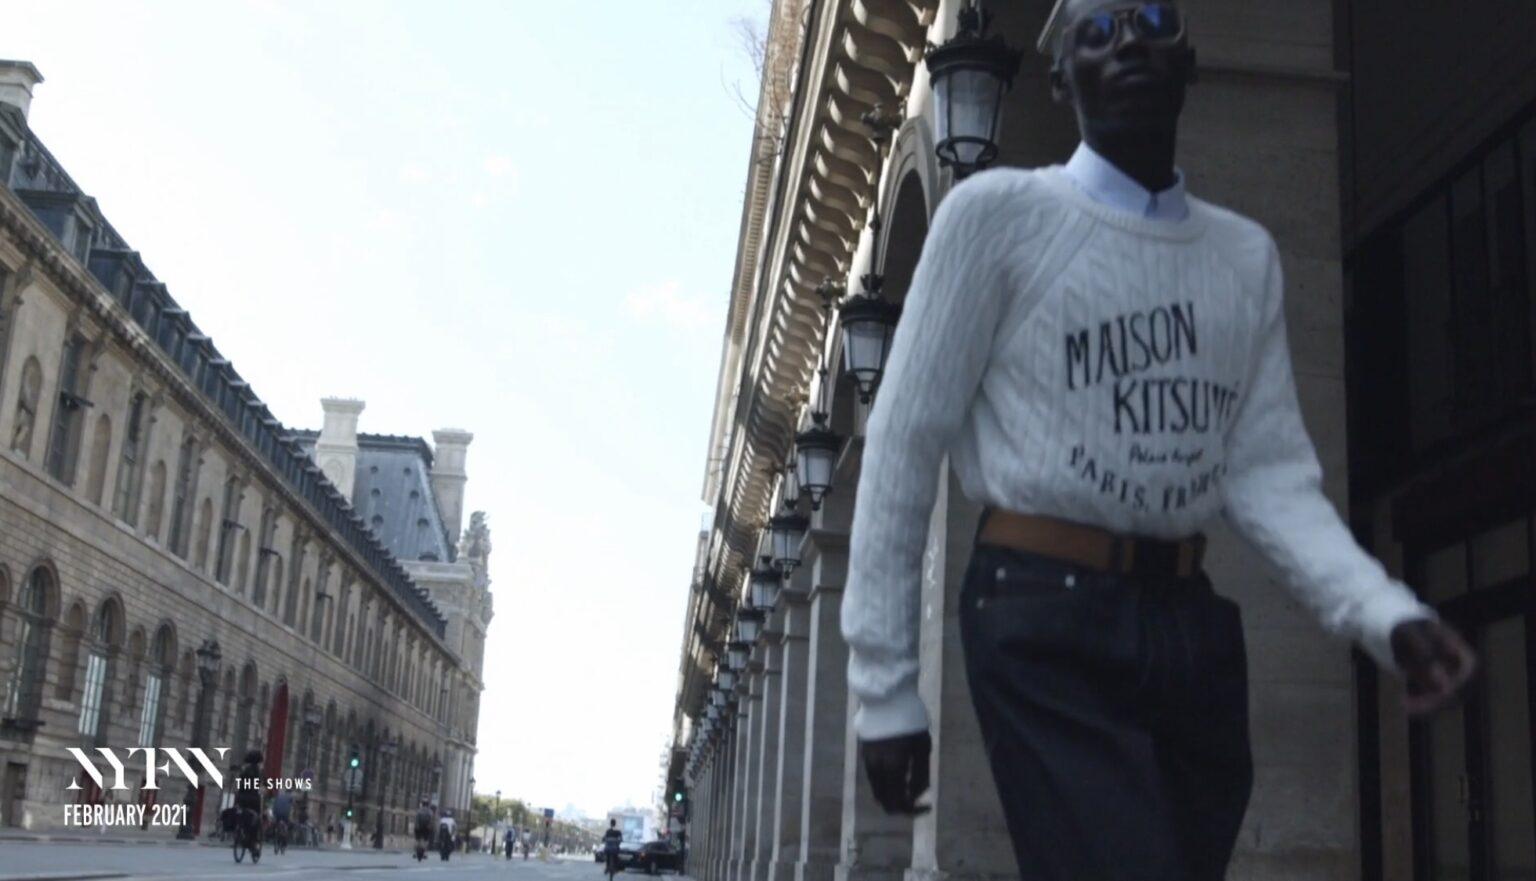 MAISON KITSUNE - NYFW A/W 2021